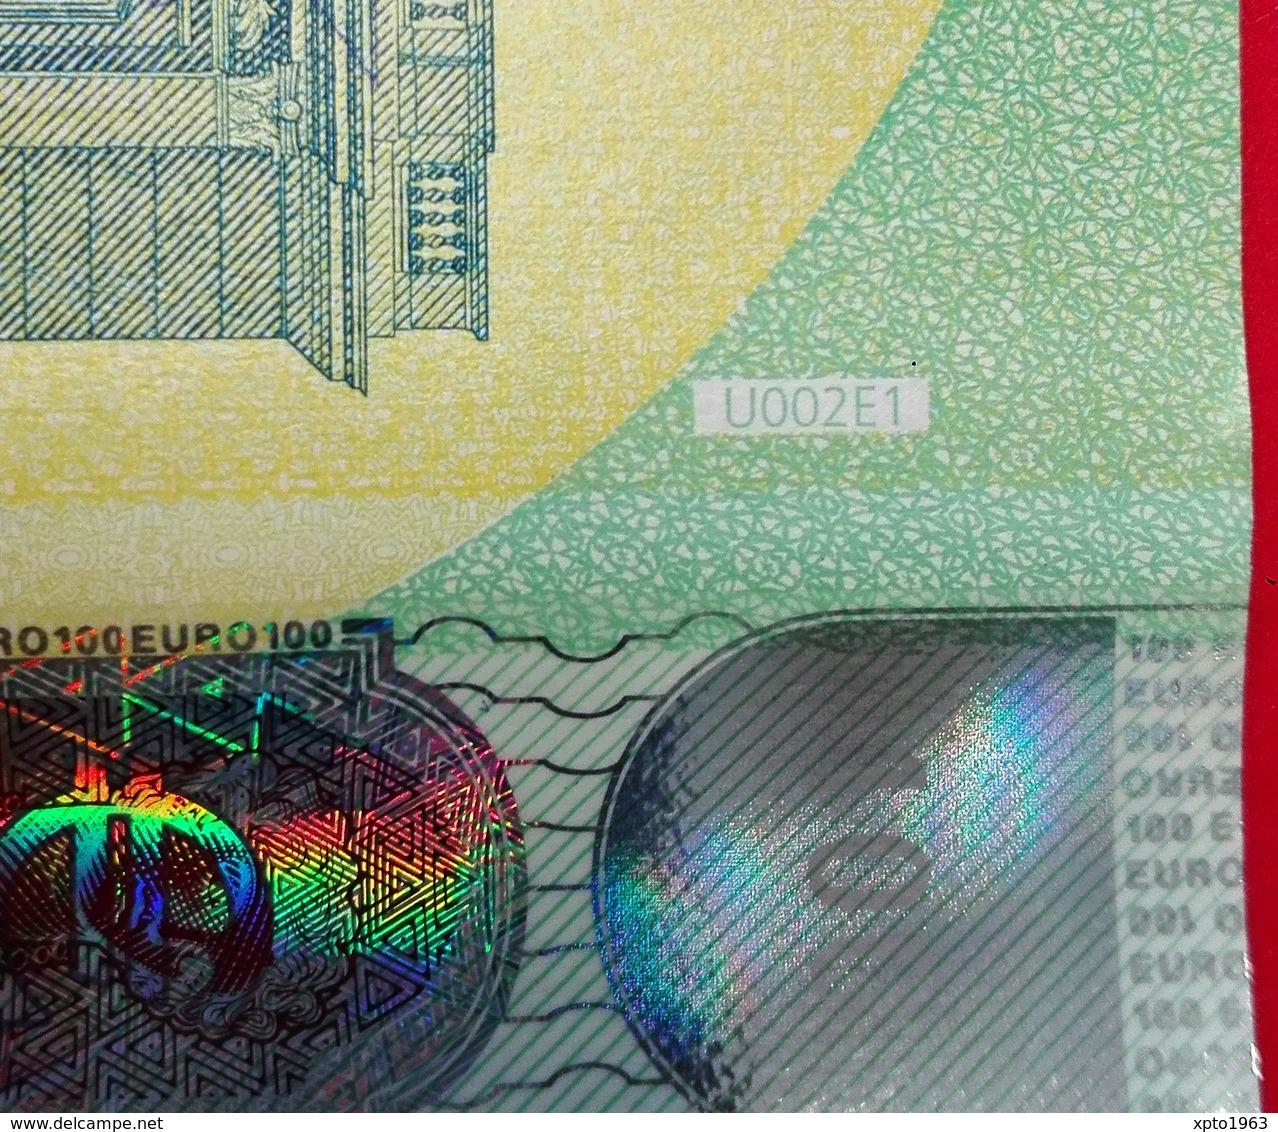 FRANCE 100 EURO - U002E1 - CHARGE 03 - Série Europa - U002 E1 - UA4039727844 - UNC NEUF - EURO